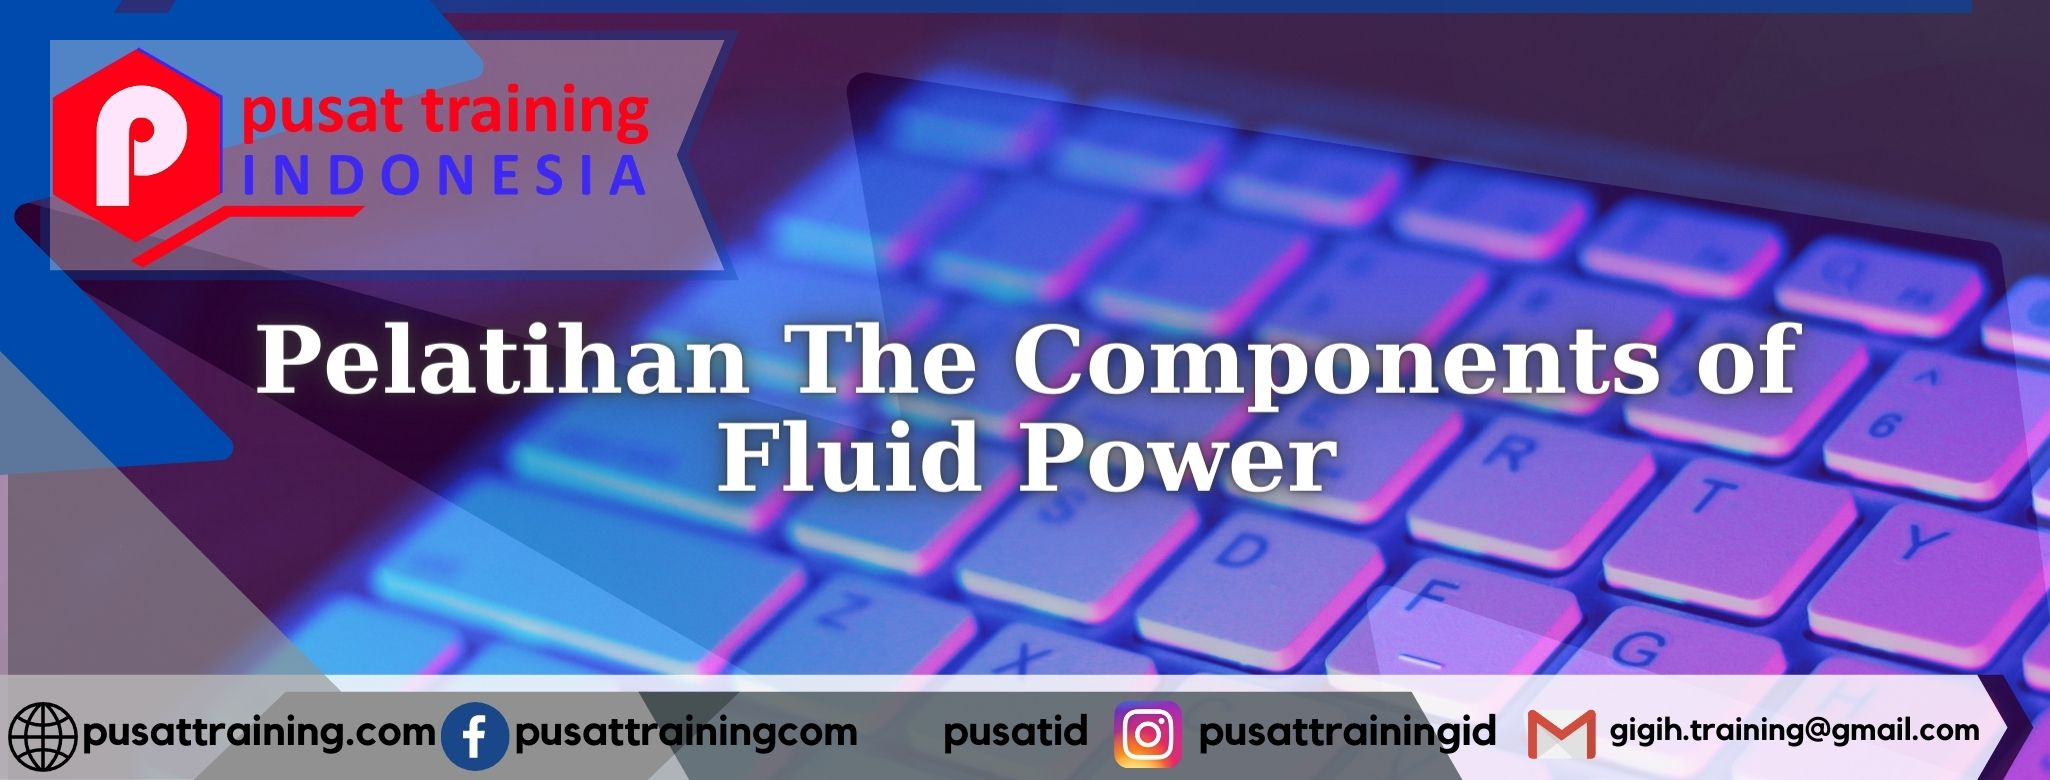 Pelatihan-The-Components-of-Fluid-Power